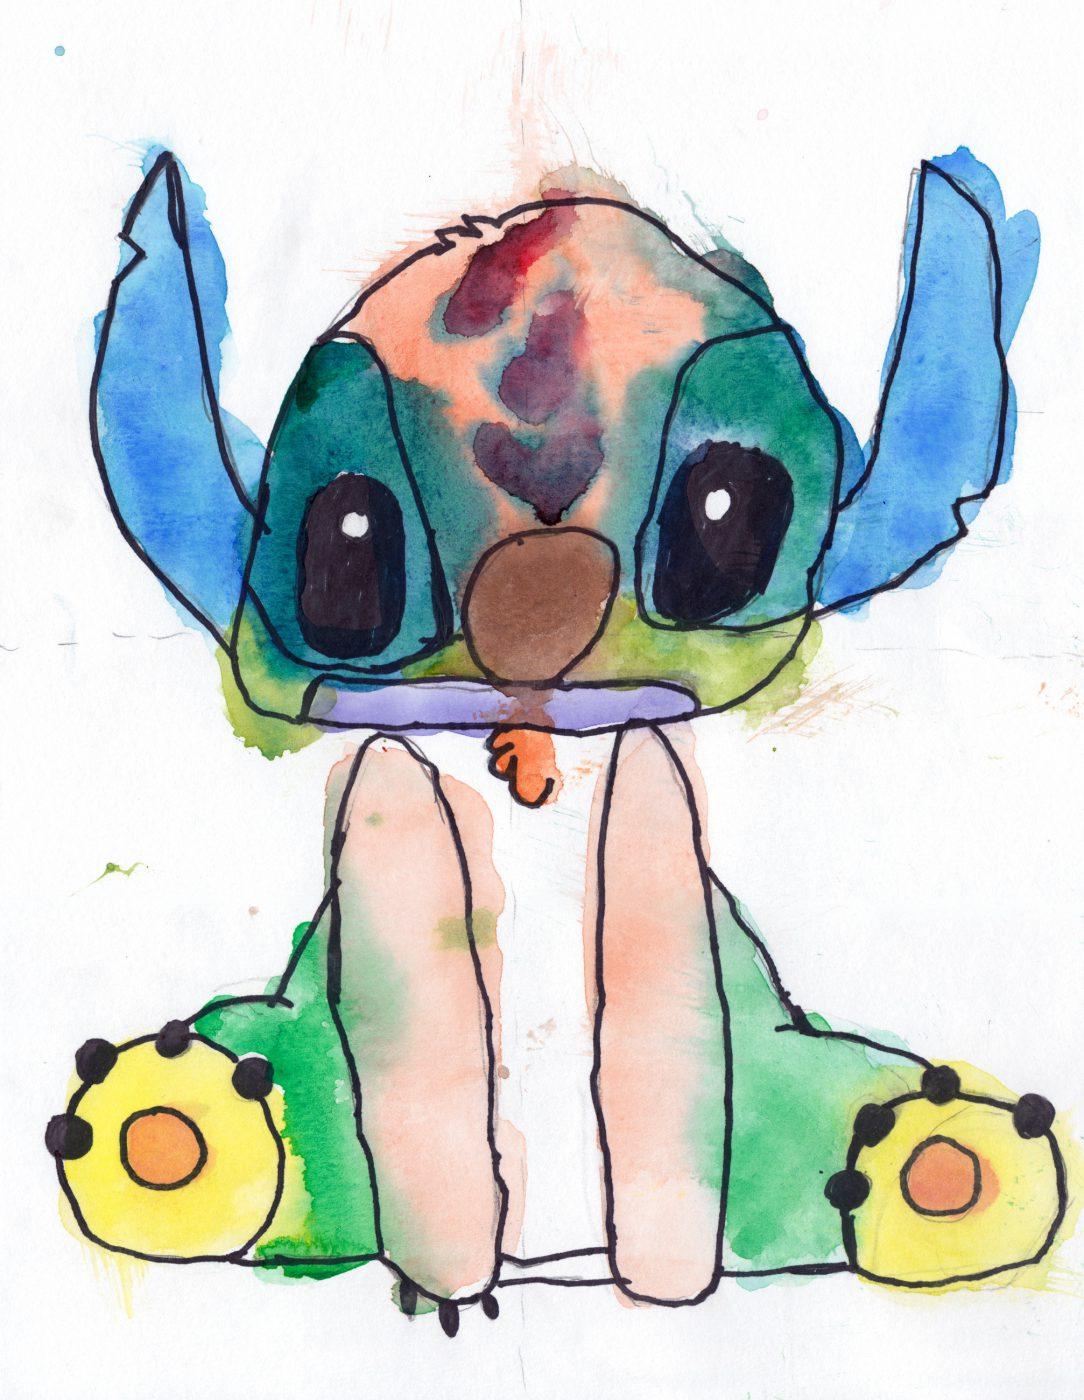 Stitch • Cartoon Art class (March, 2018)